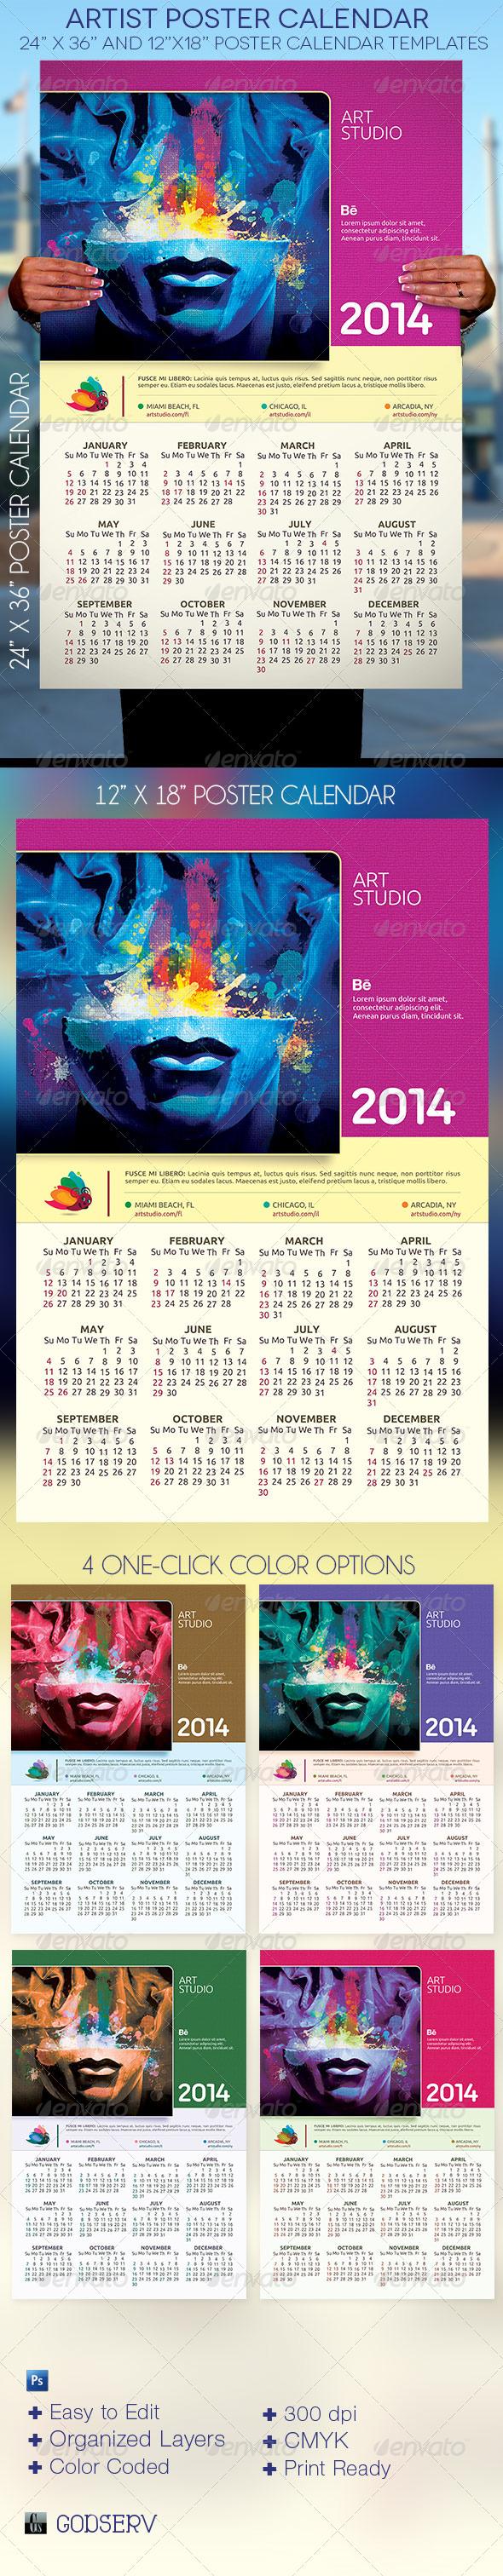 GraphicRiver Artist Poster Calendar Template 5181359